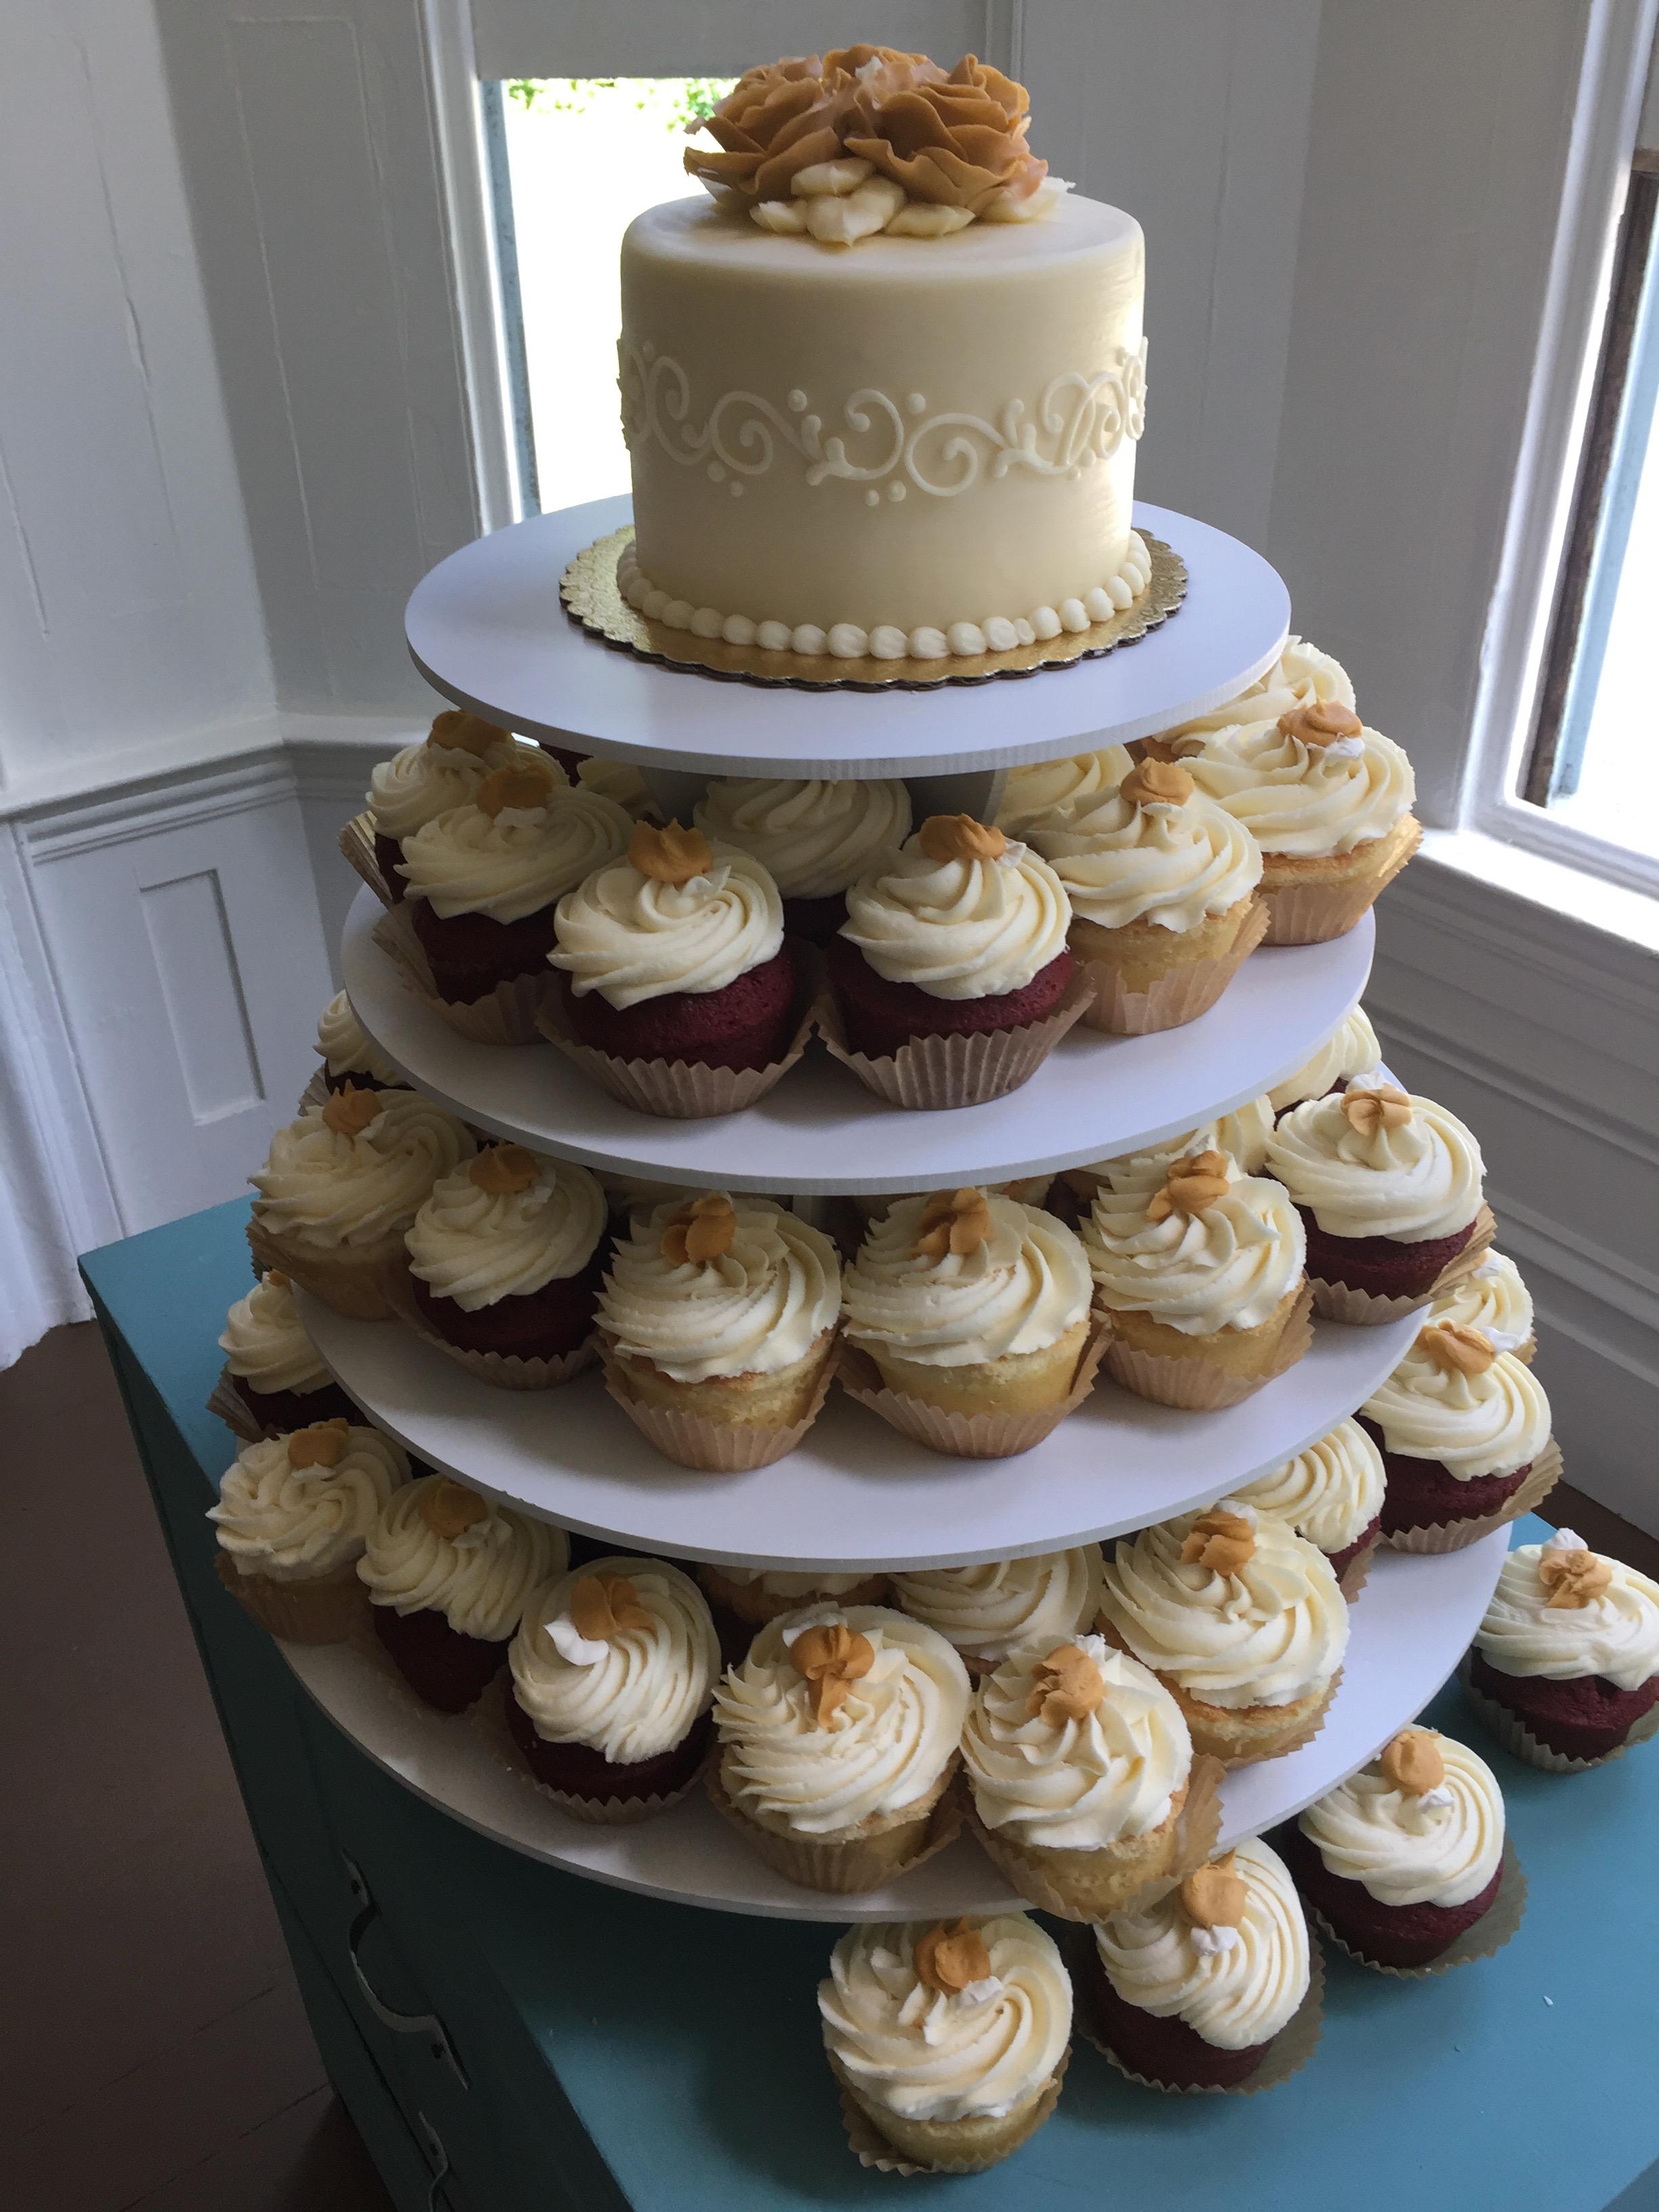 70th Birthday Celebration Cake and Cupcakes